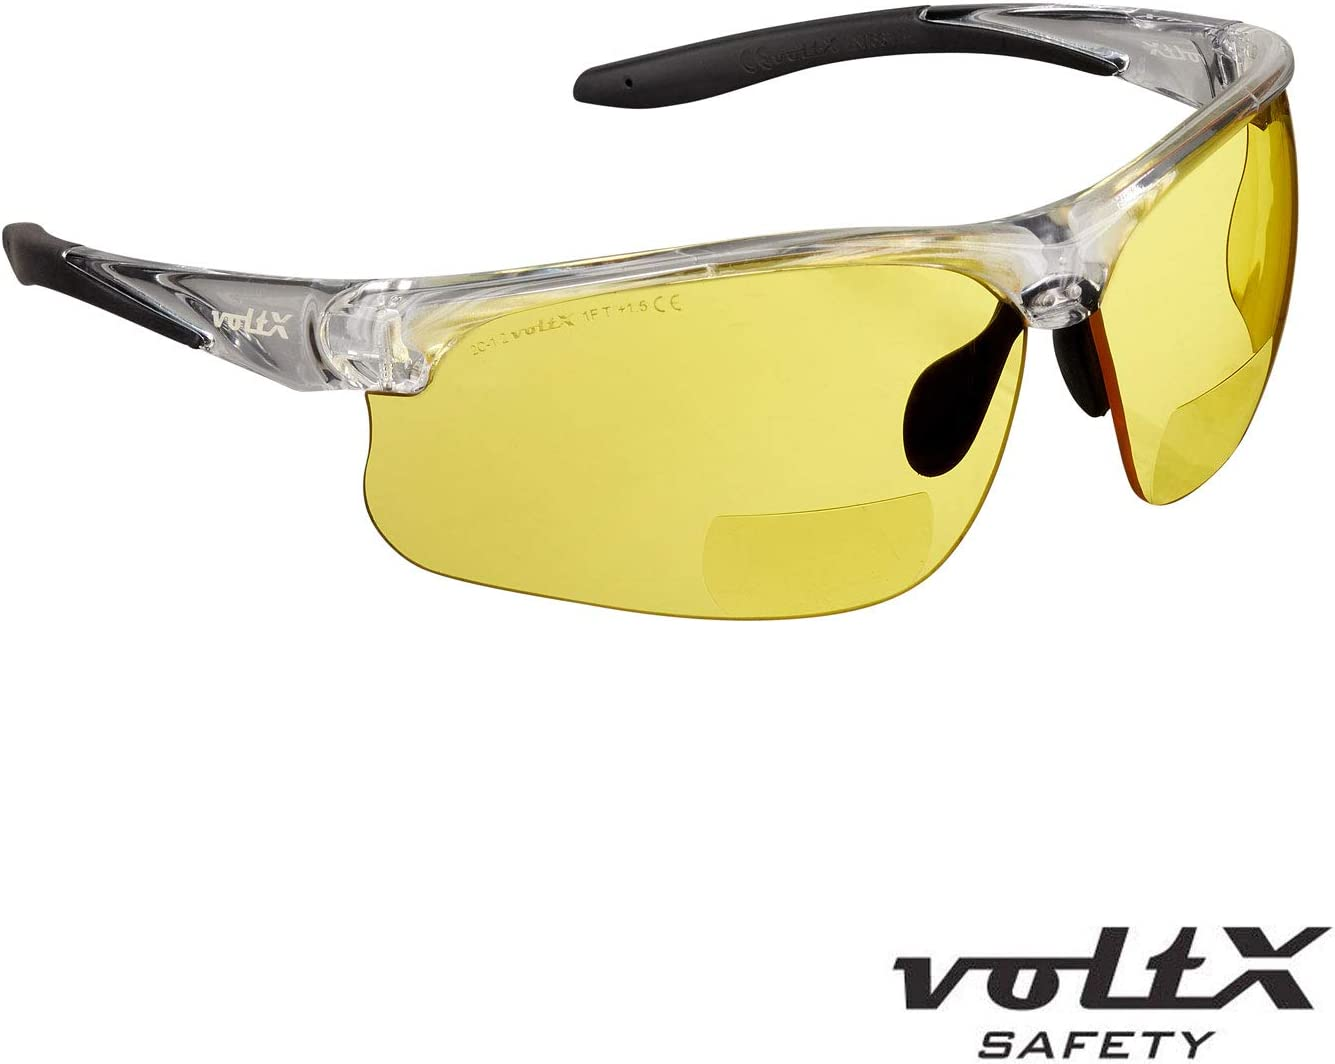 BOLLE Contour CONTESP Premium Occhiali di sicurezza Occhiali lente ESP 2,5 o 10 PAIA